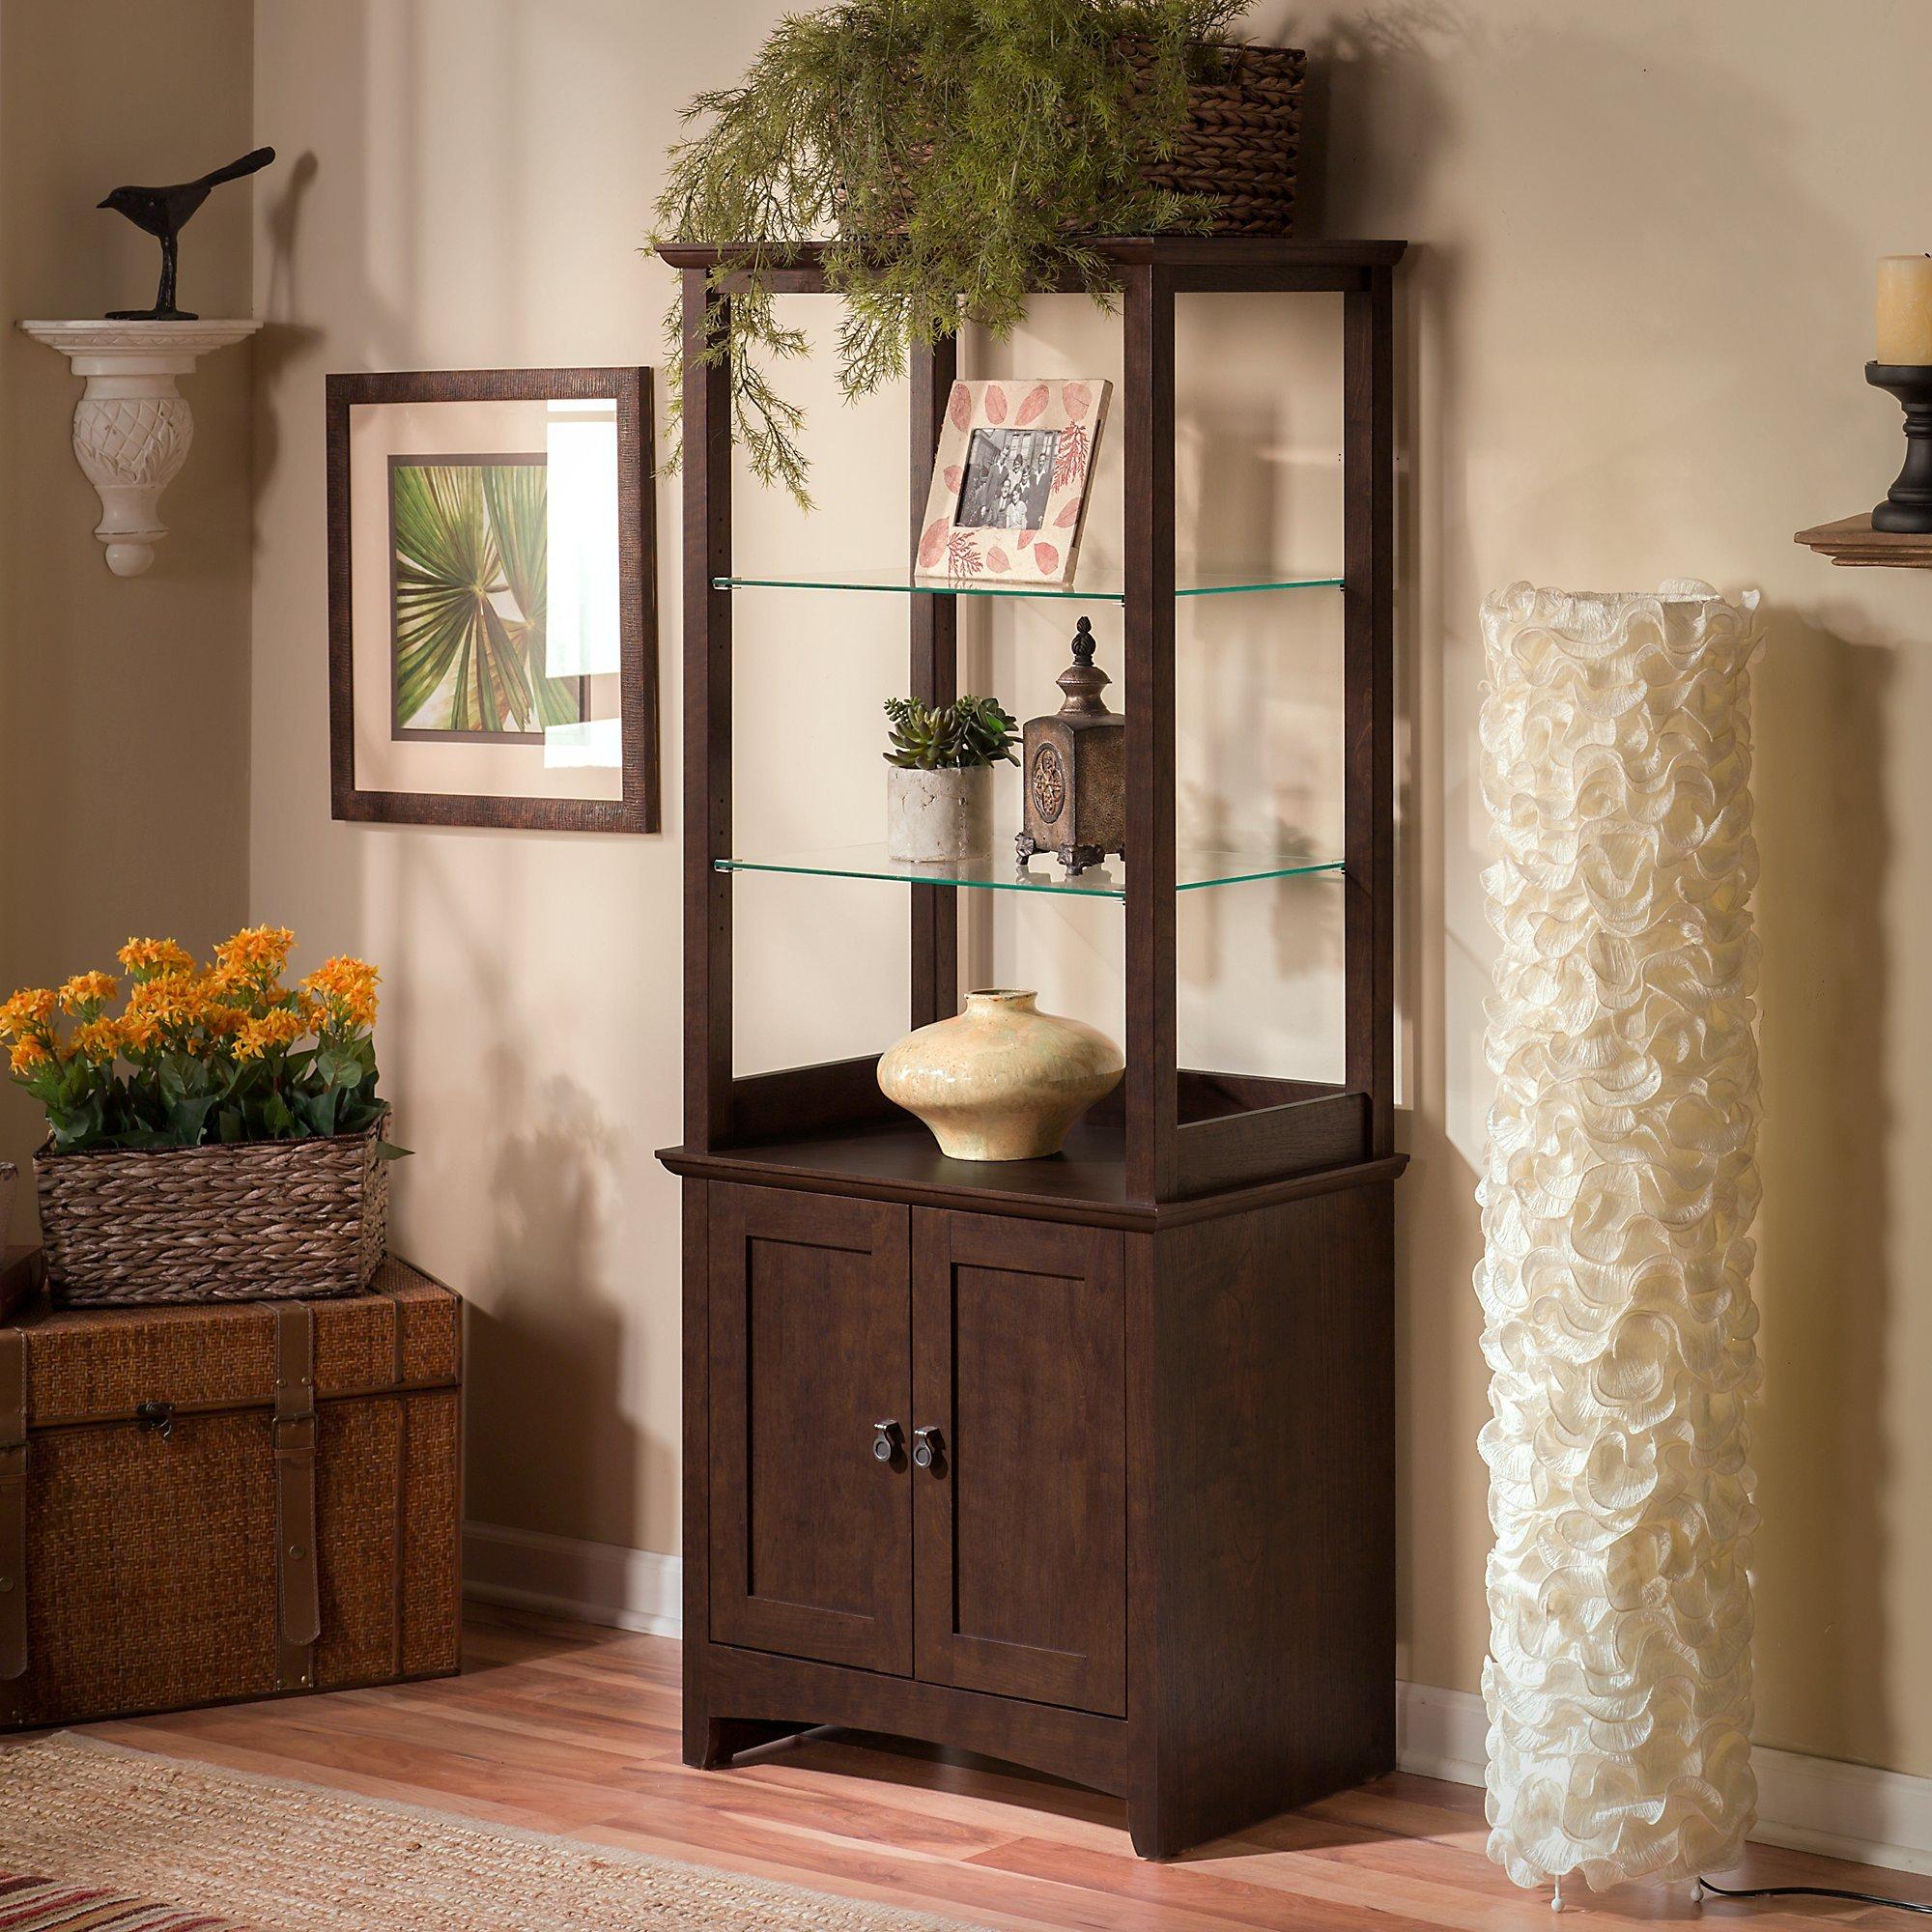 living room cabinets amazon com rh amazon com living room cabinets ideas living room cabinets black